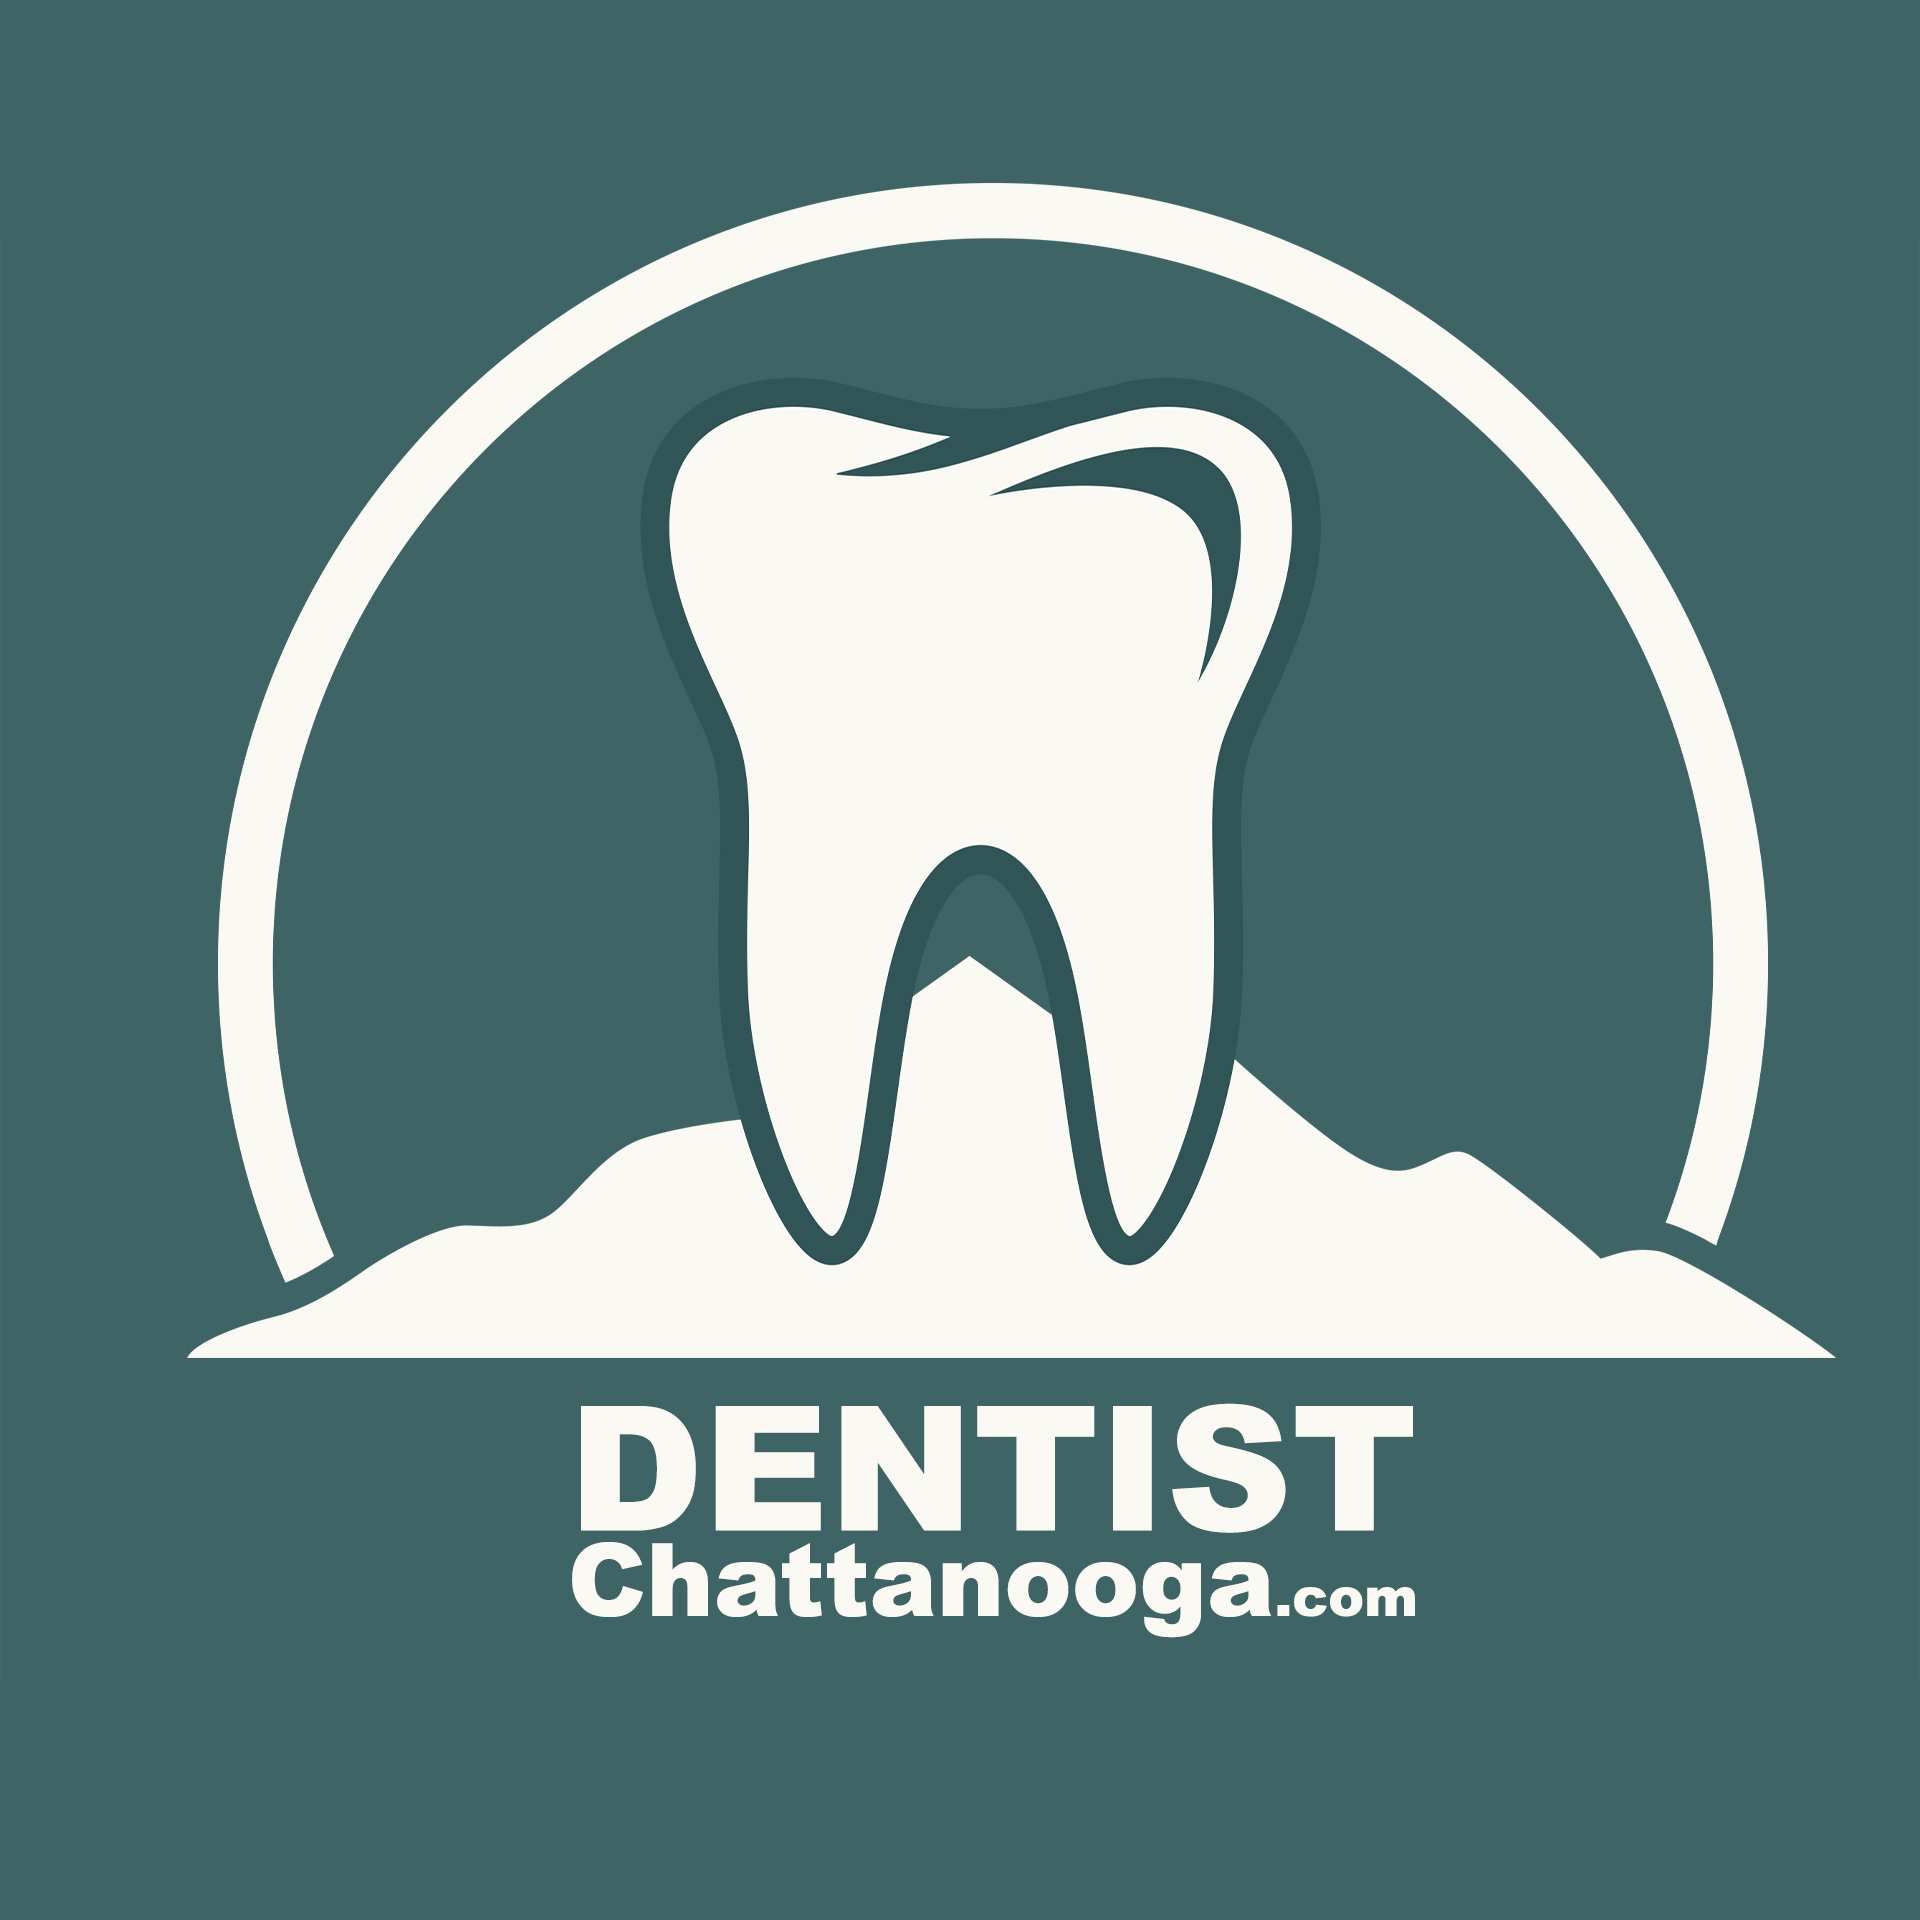 Dentist Of Chattanooga